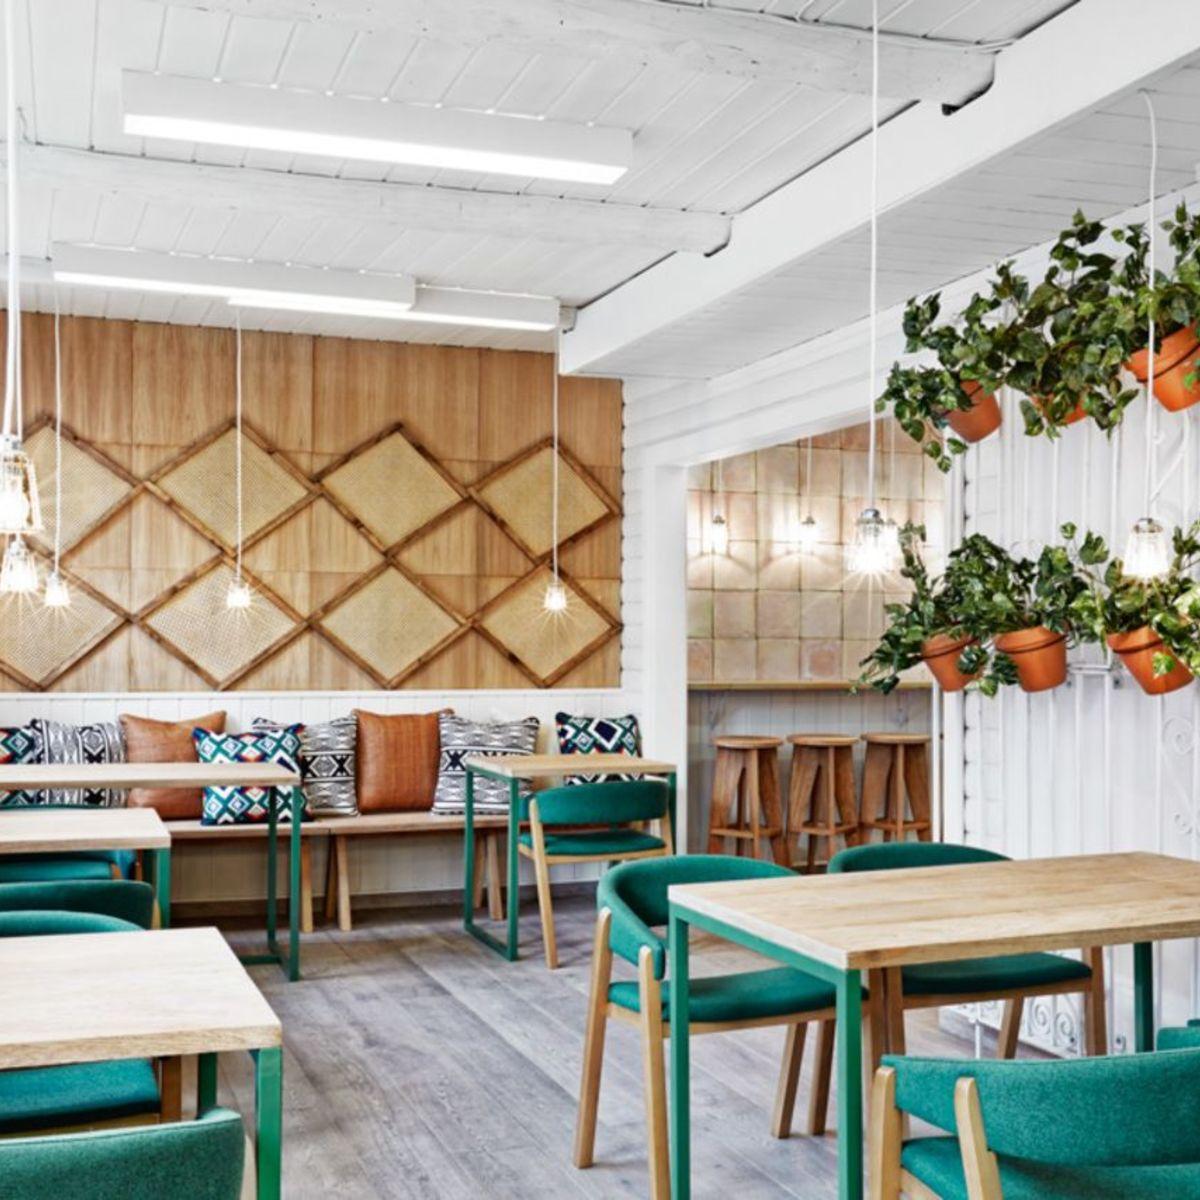 Merveilleux Masquespacio Eco Friendly Branding And Interior Design In Oslo